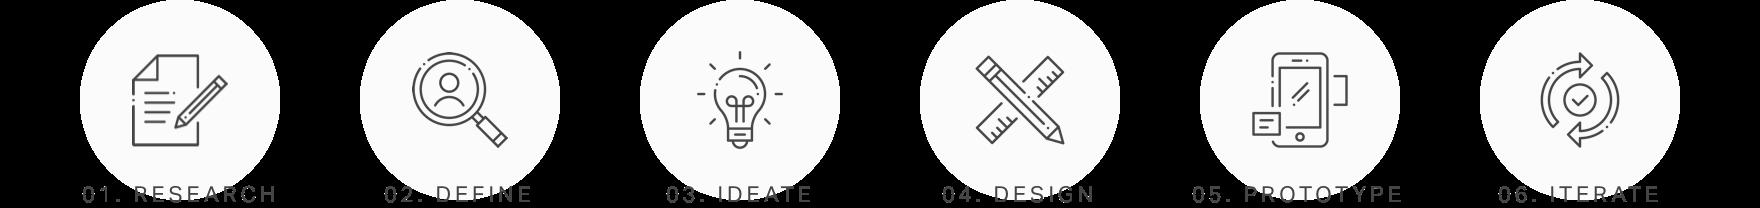 design-process-grey.png